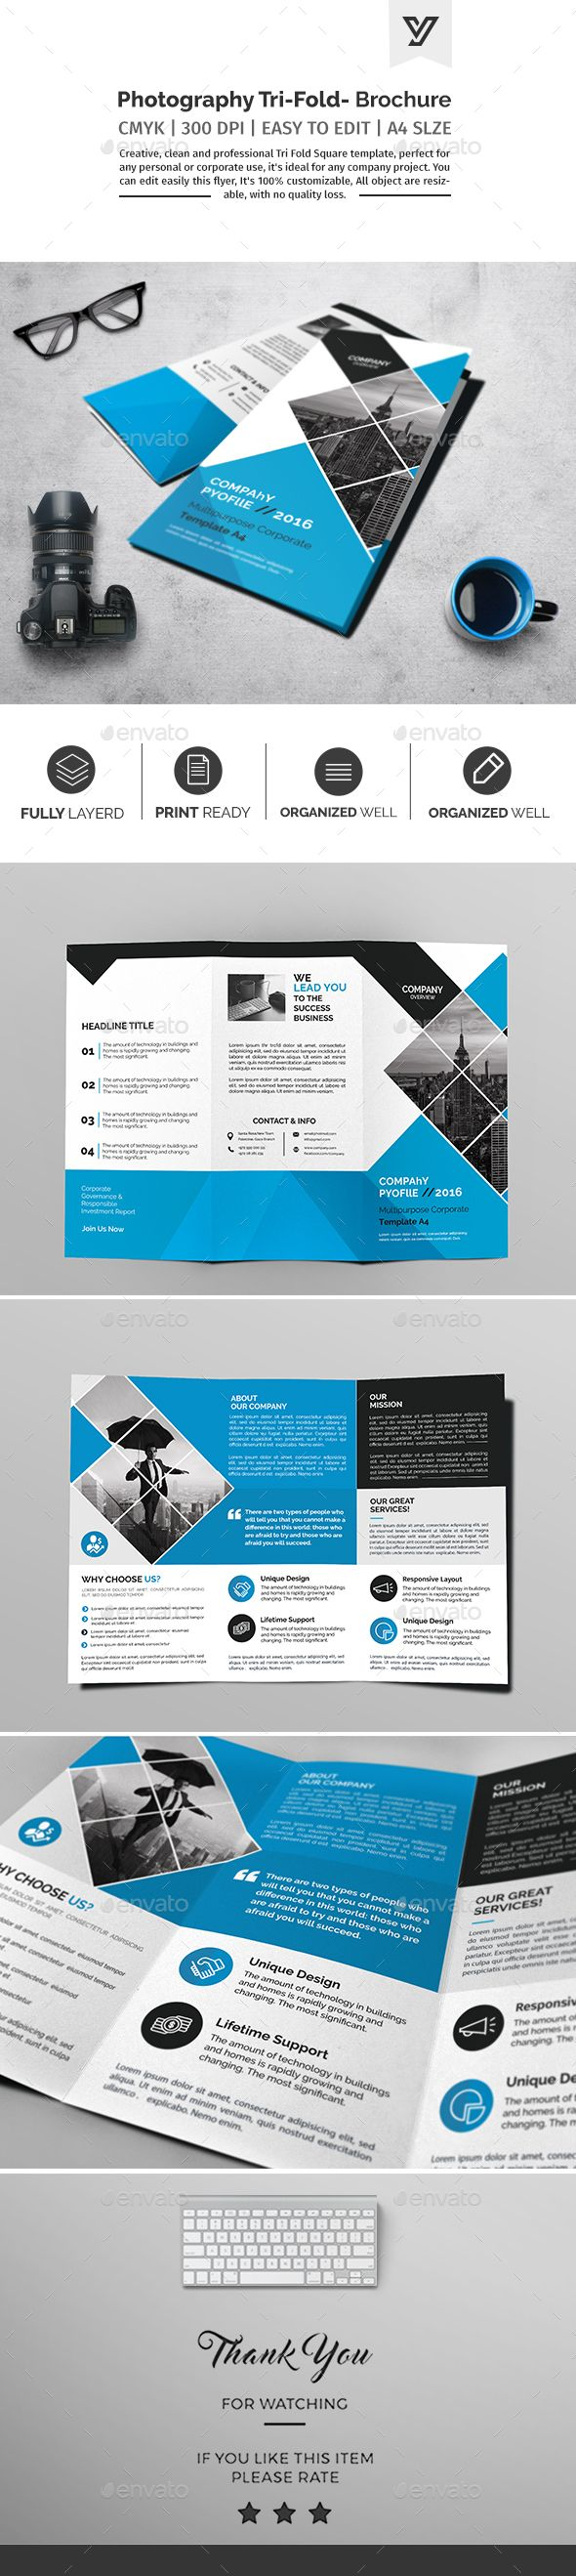 Corporate Tri-fold Brochure Template PSD. Download here: https://graphicriver.net/item/corporate-trifold-brochure-template-03/17381361?ref=ksioks